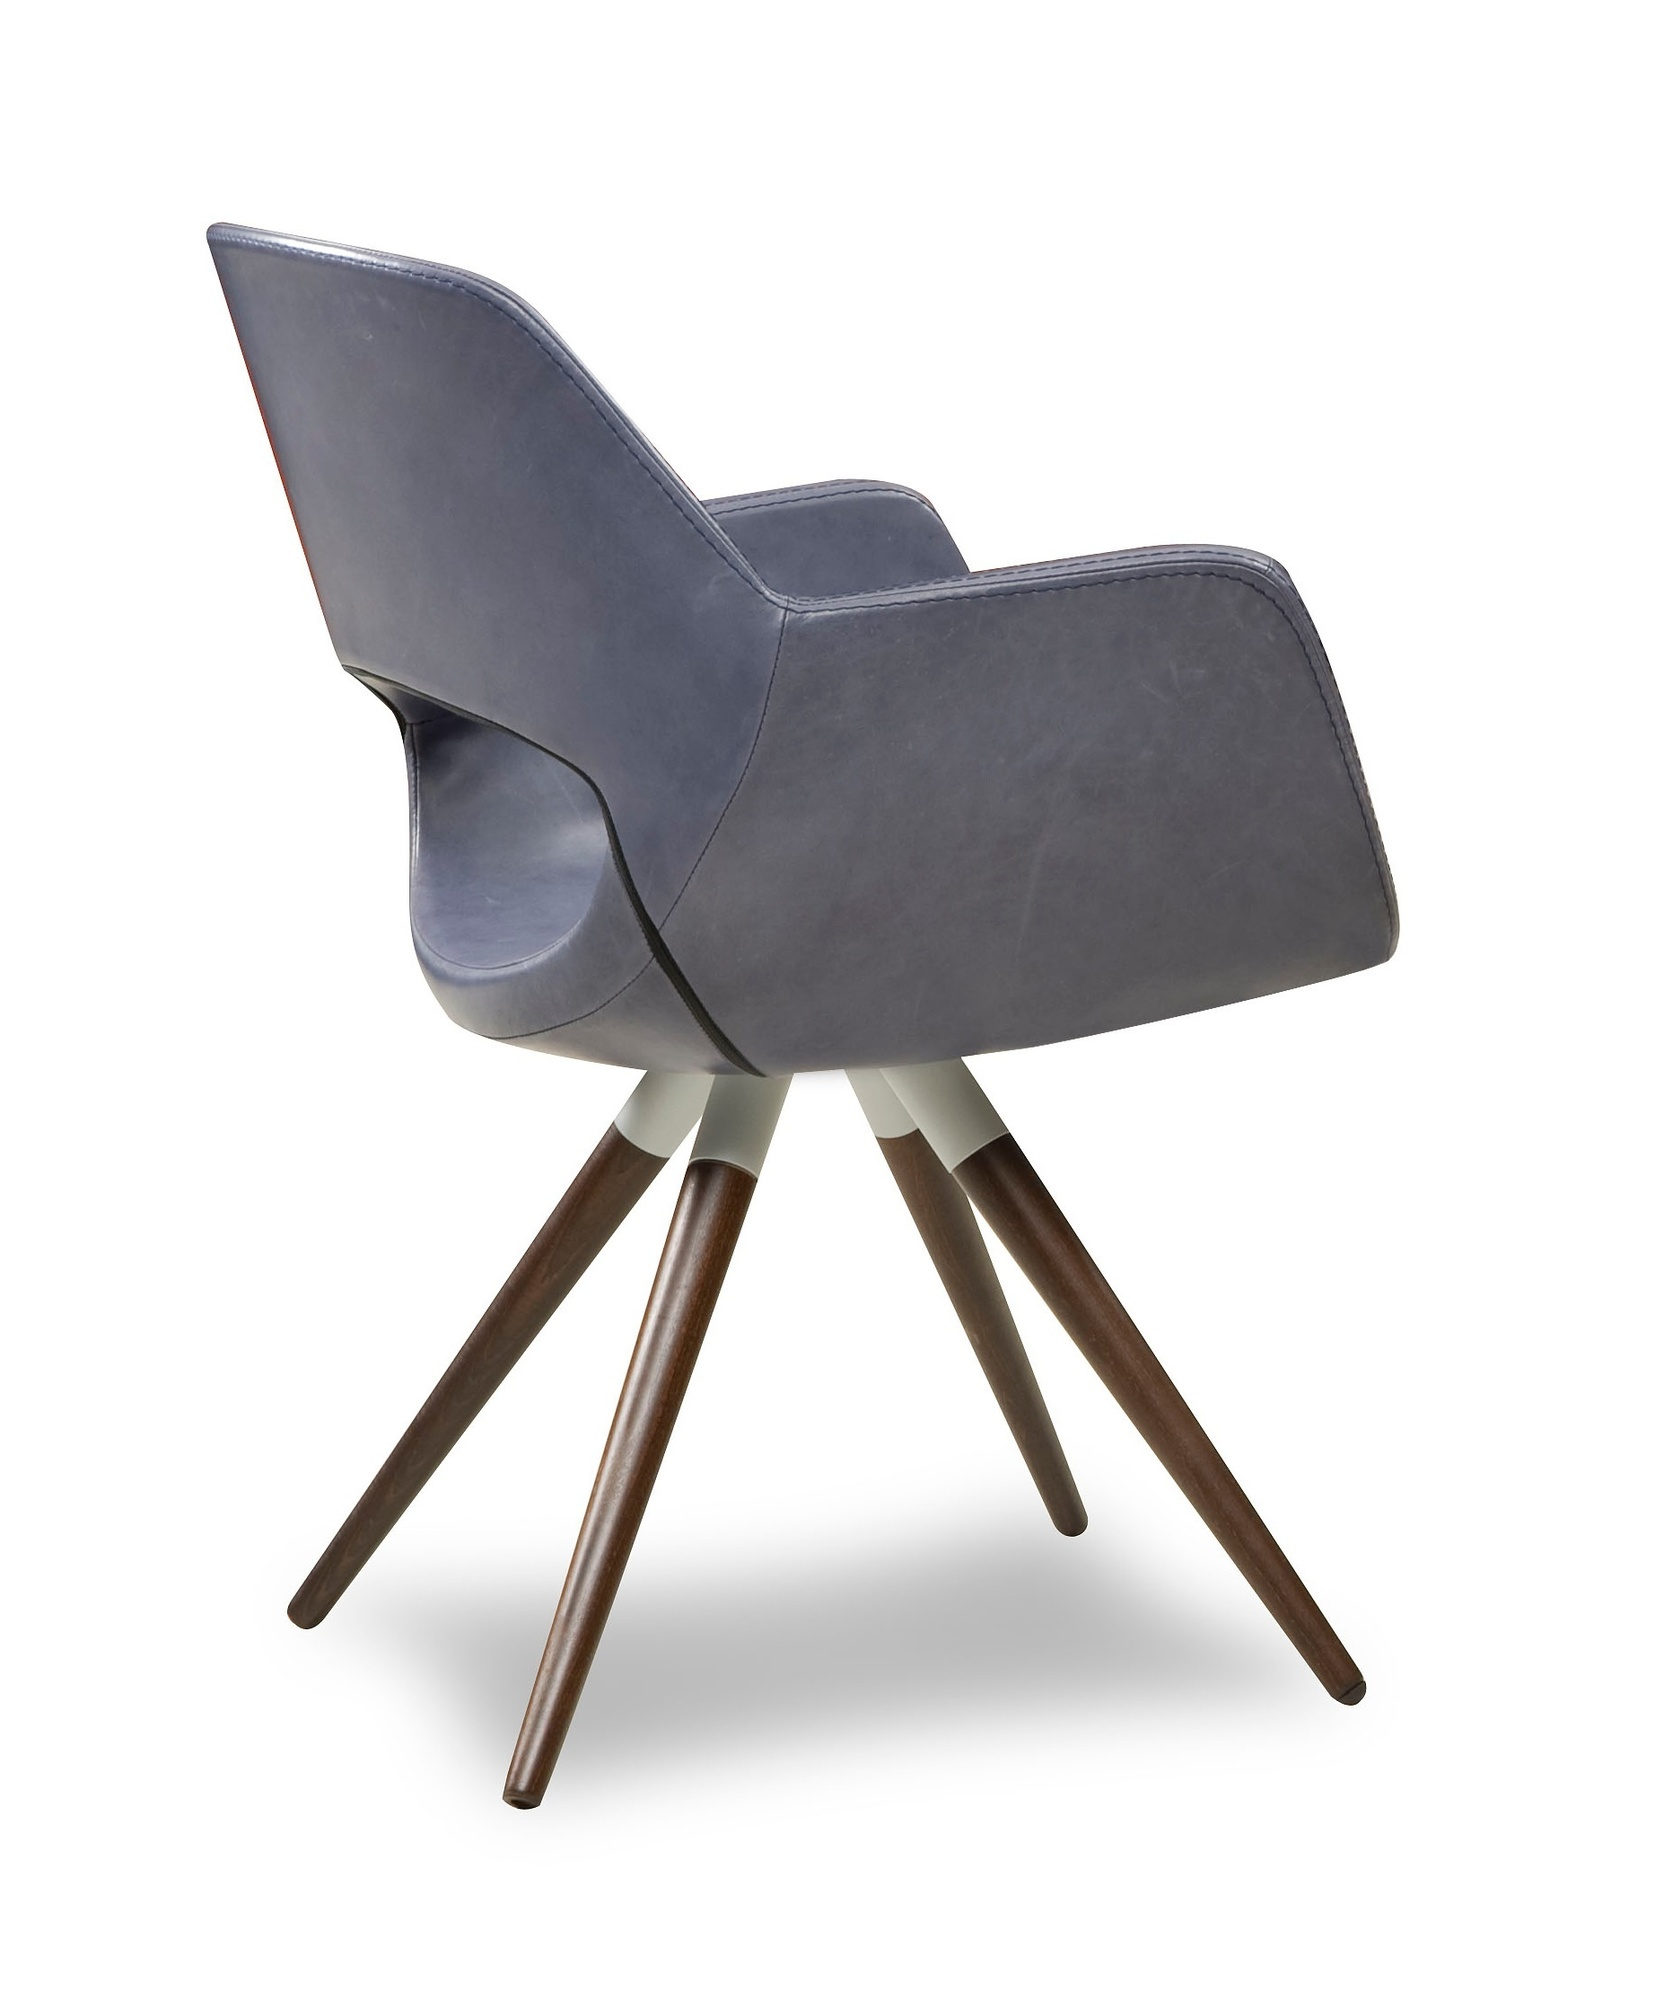 eetstoel-karin-houten-poot-hout-spijlpoot-eikenhout-beukenhout-kuipstoel-stoel-eetkamerstoel-open-rugleuning-rug-armstoel-armleuning-kuip-leder-leer-stof-ancora-design-stoel